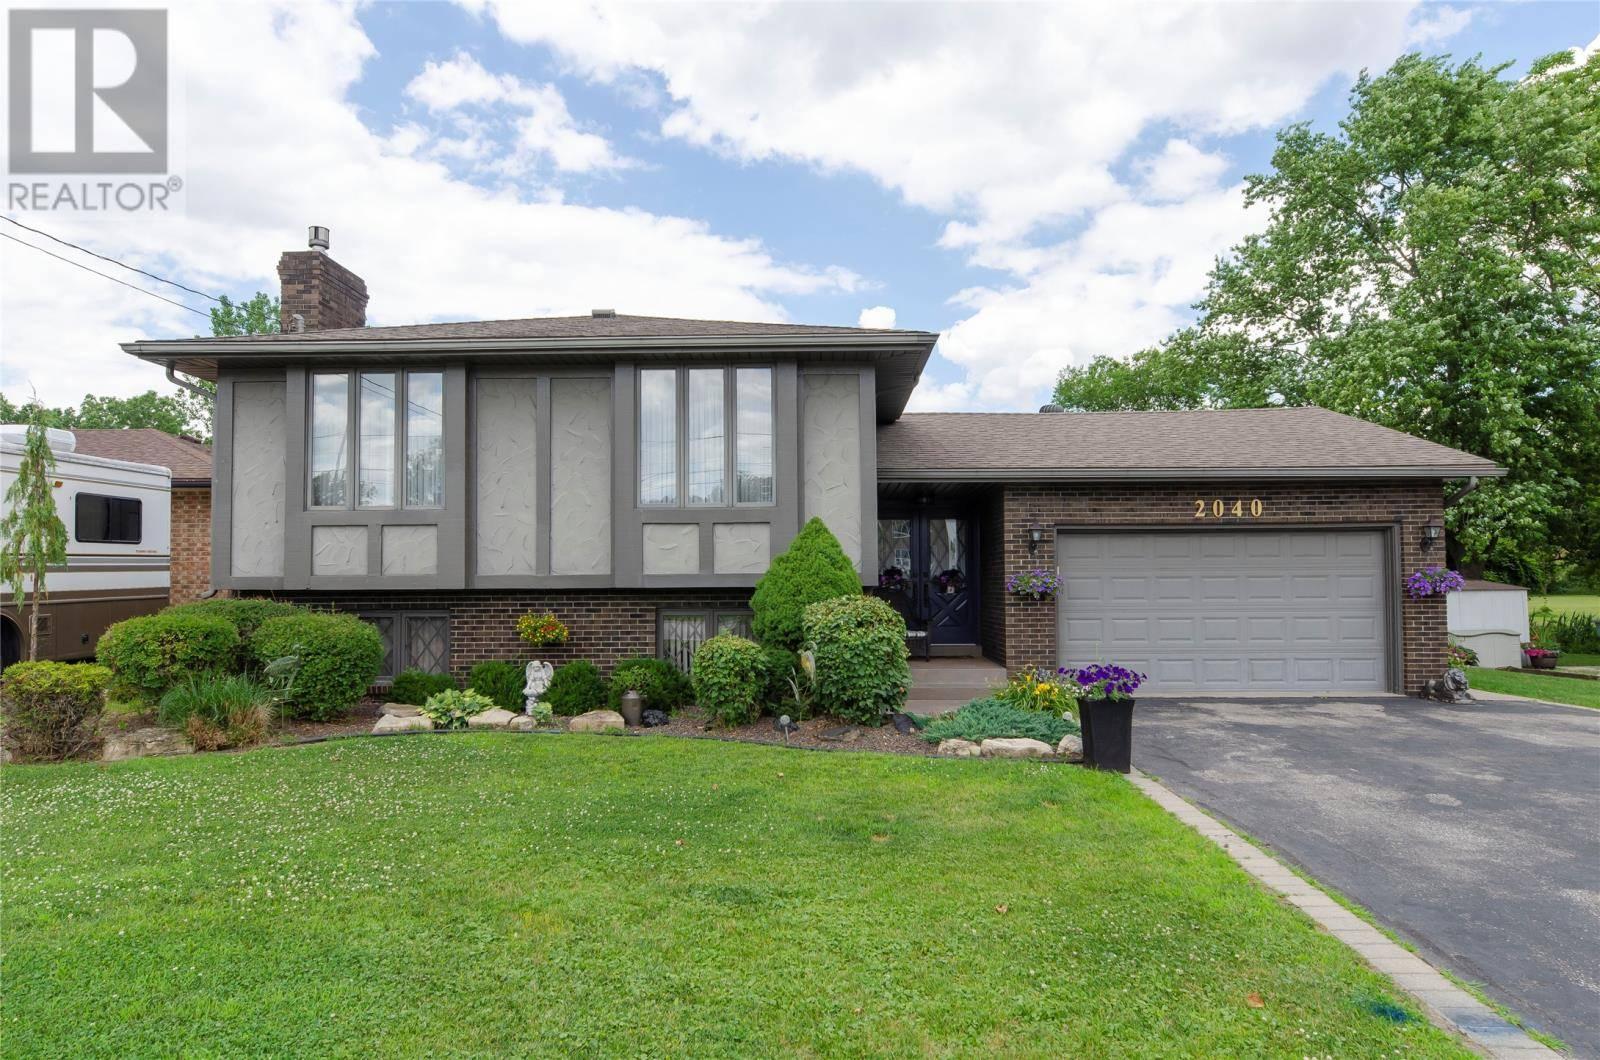 House for sale at 2040 Spring Garden  Windsor Ontario - MLS: 19022655